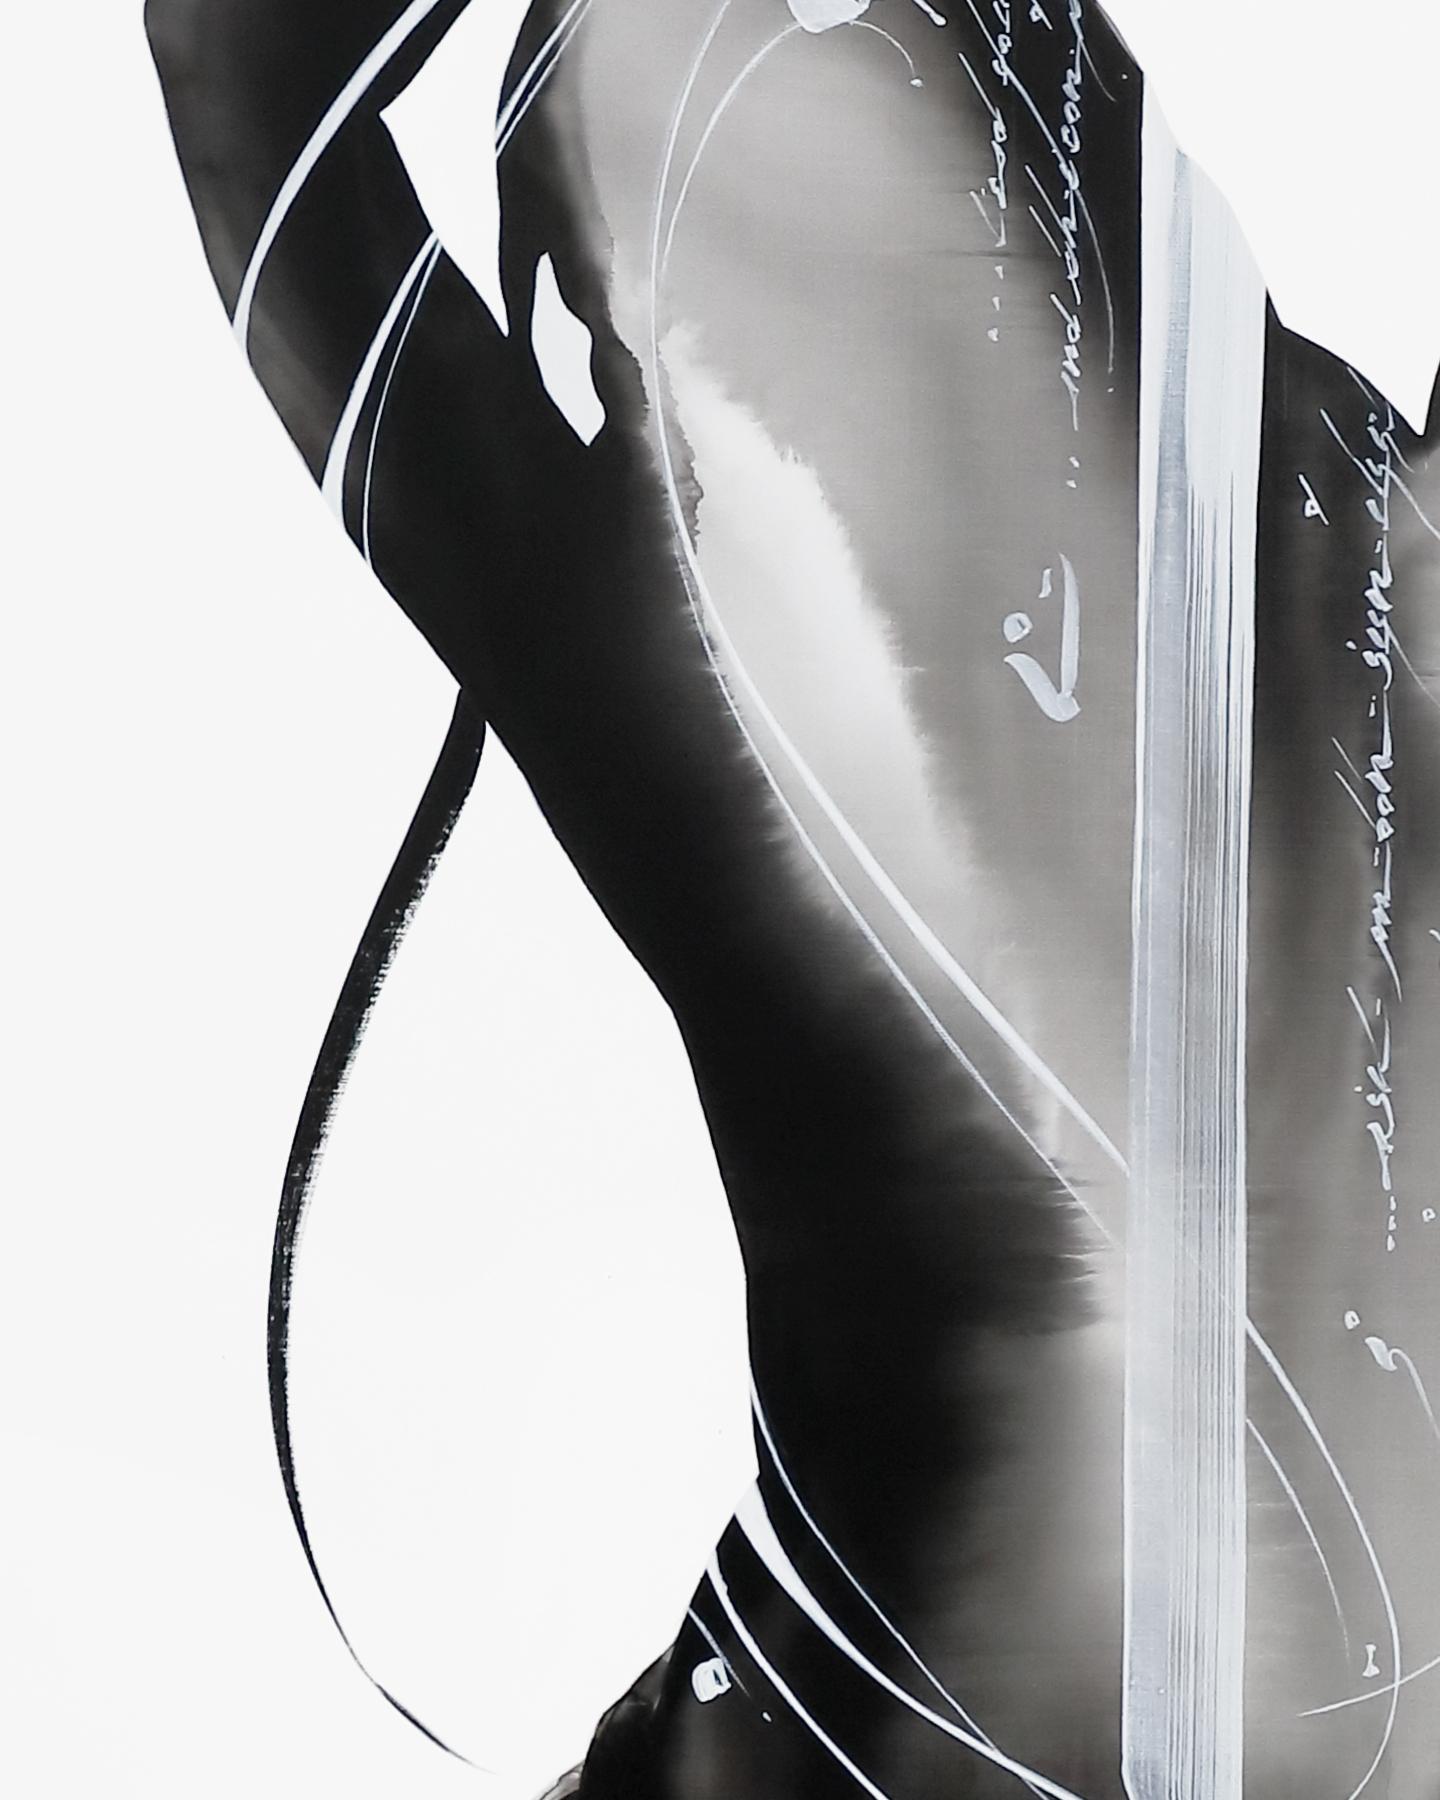 NOURAH 2 | Acrylic on canvas, 91 x 117cm, 2020, Model : Nourah Original